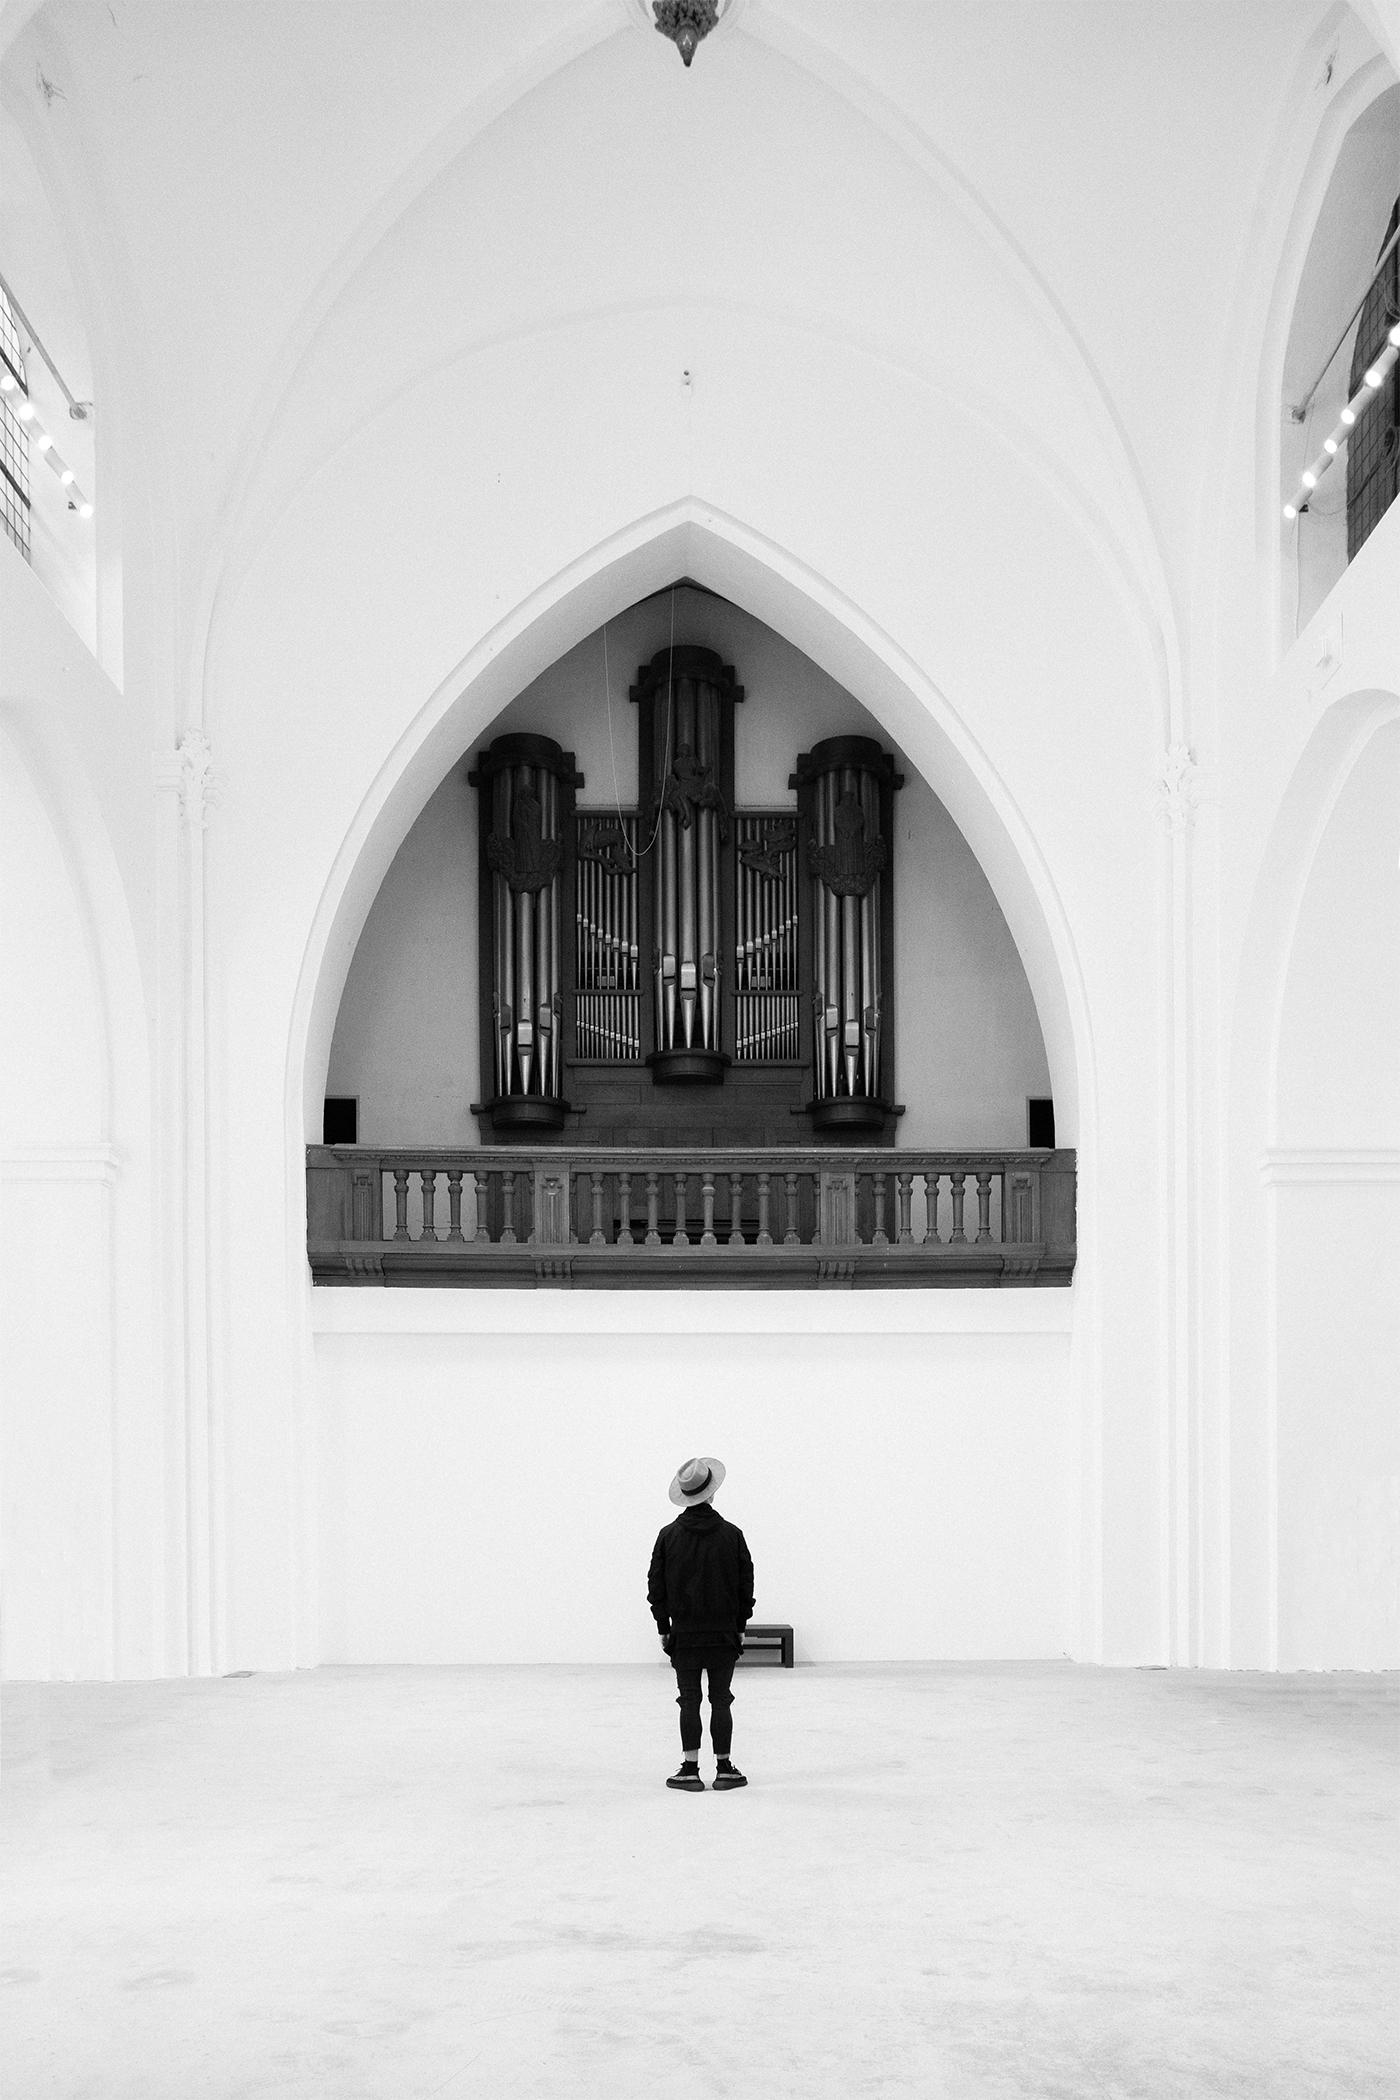 Age of Church